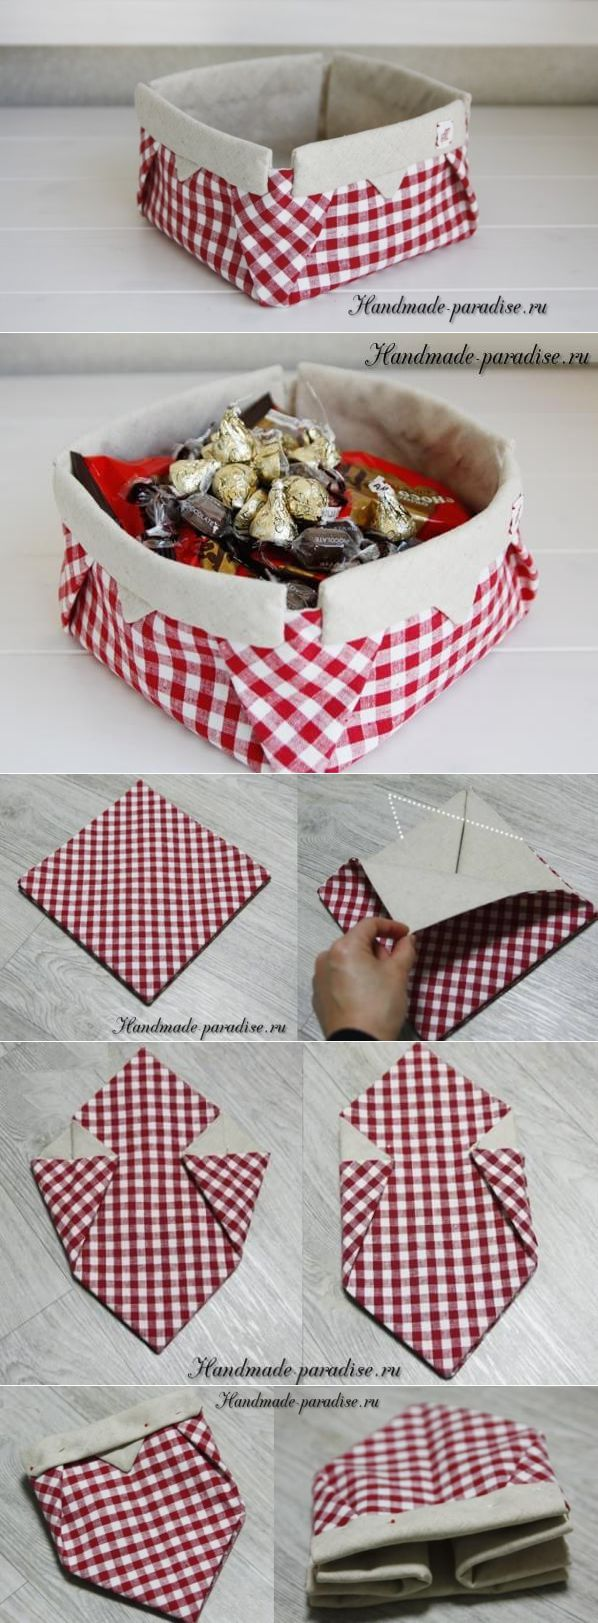 Корзинка из ткани в технике оригами - Handmade-Paradise